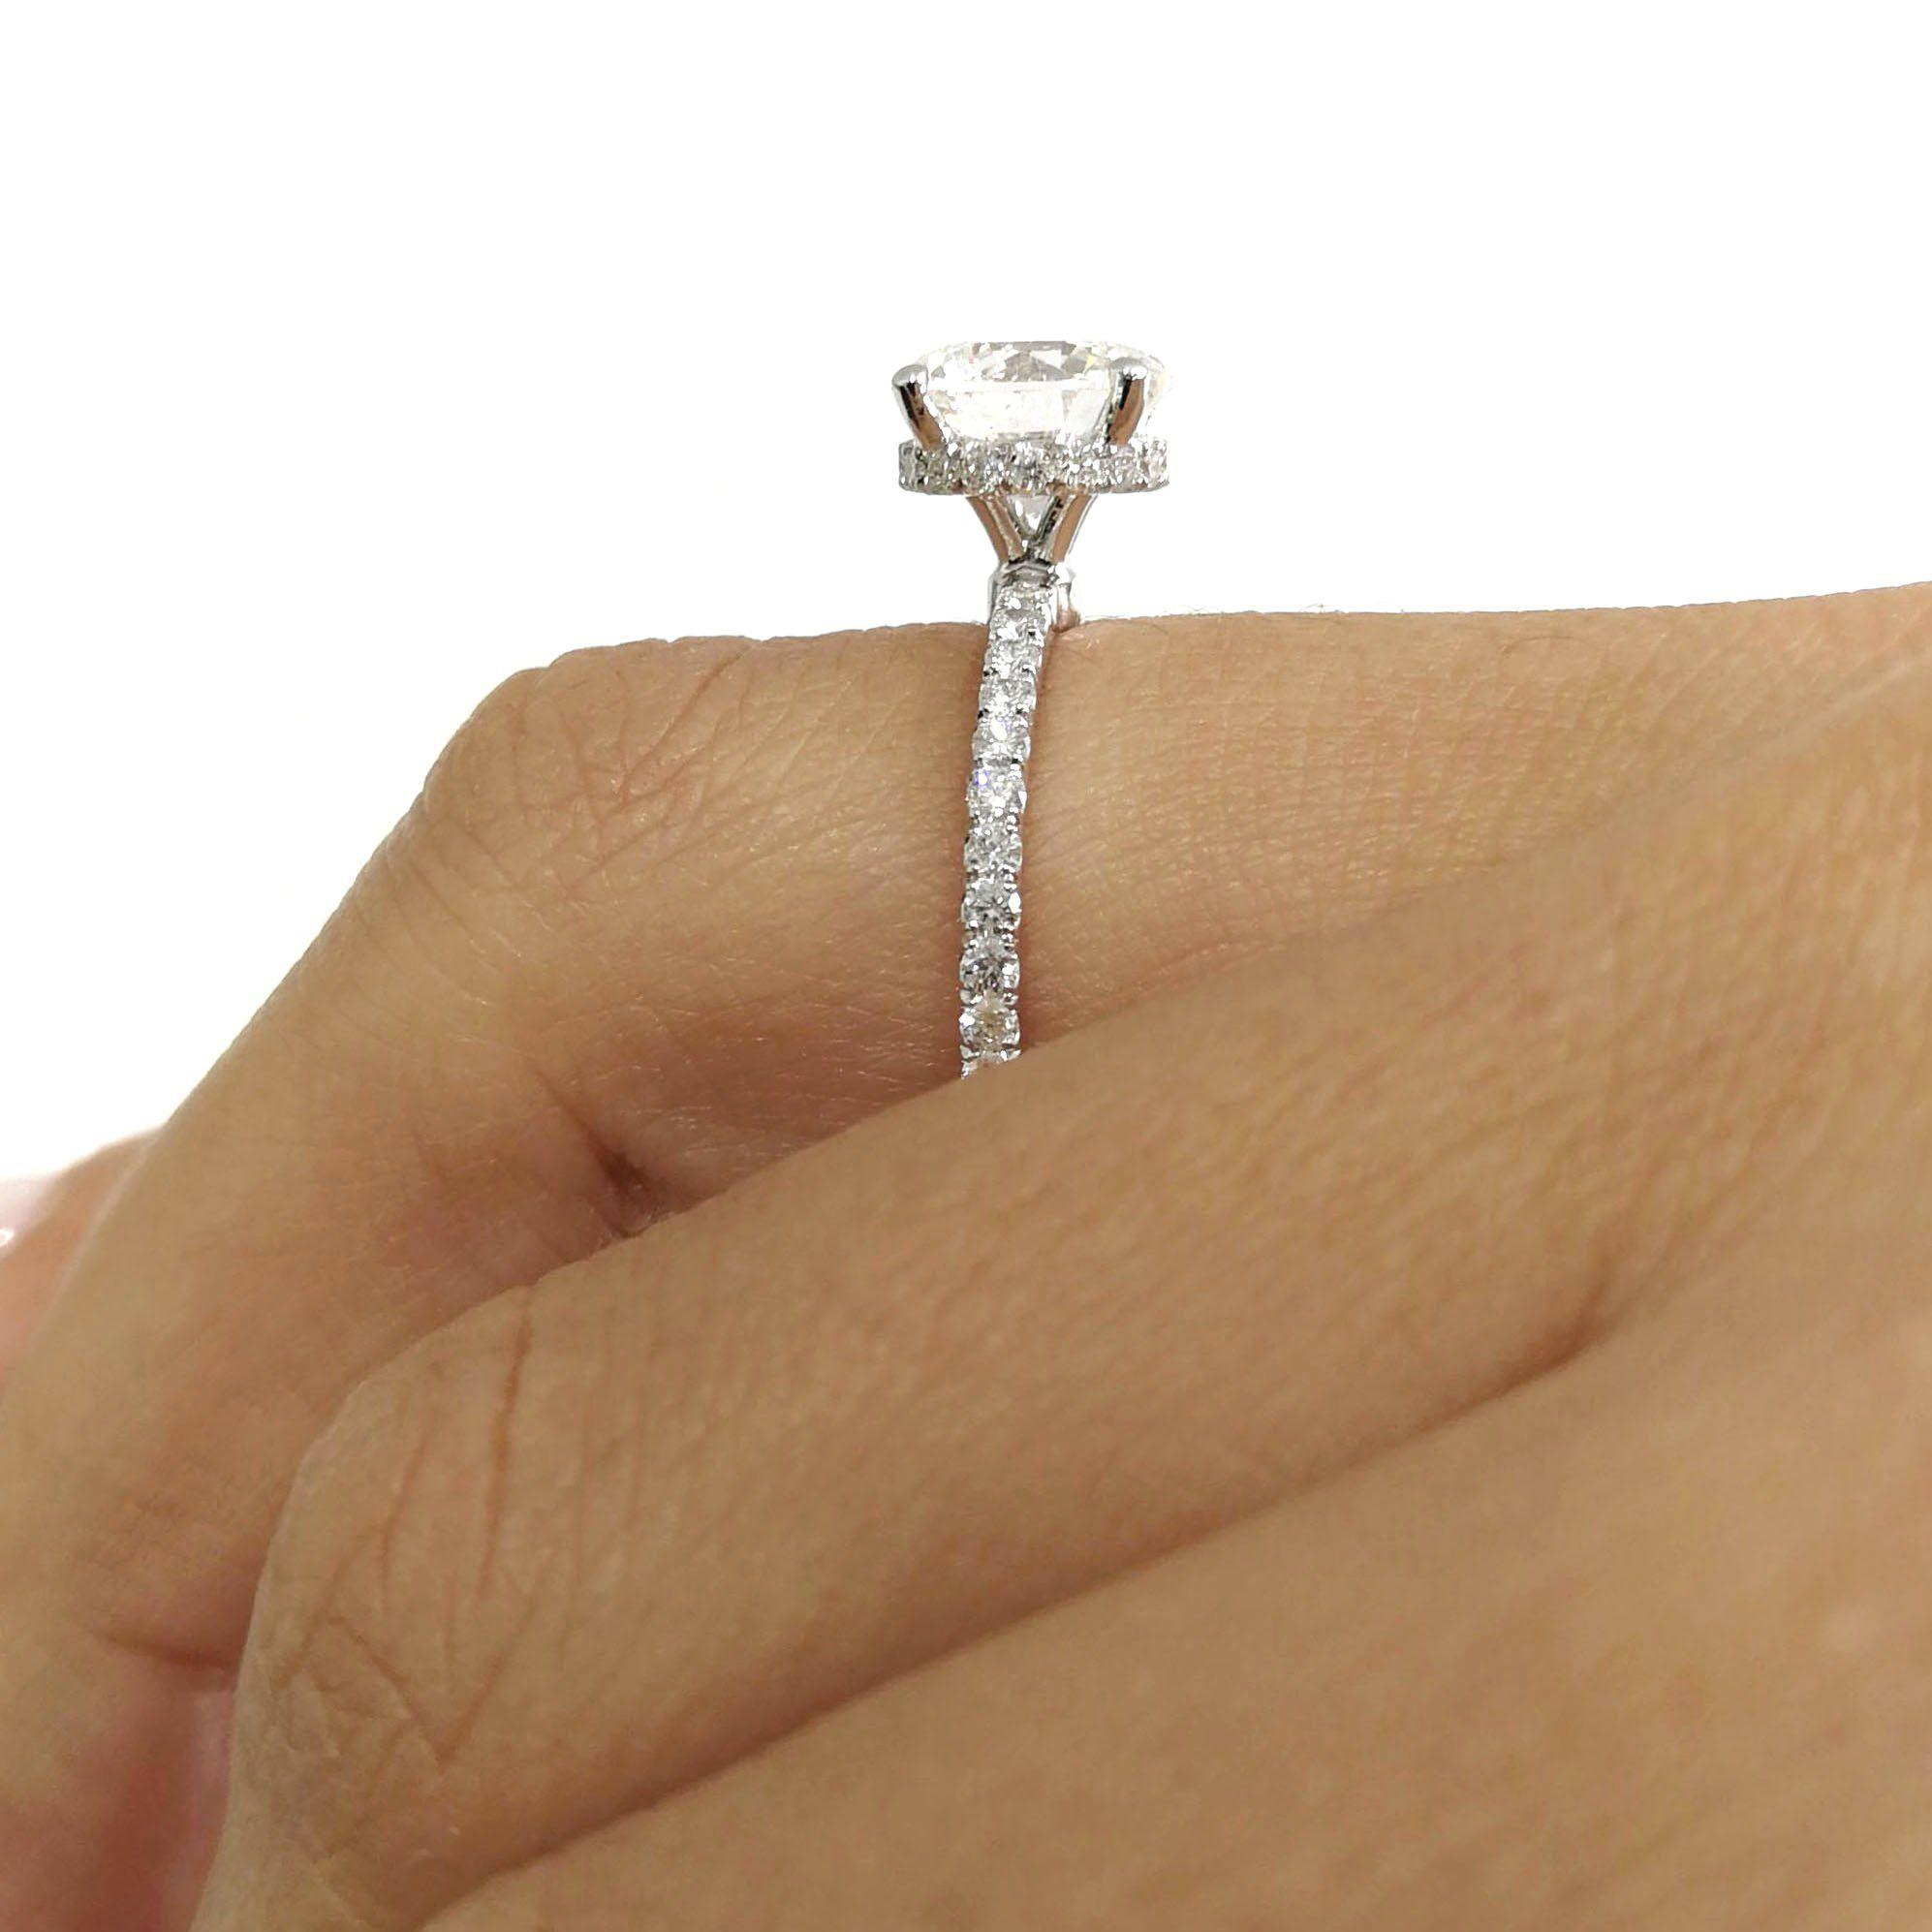 The Vivienne Engagement Ring 2 Carat D Vs2 Round Hidden Halo Design Ring 18k White Gold J99144 Engagement Ring White Gold Round Halo Engagement Rings Diamond Wedding Bands